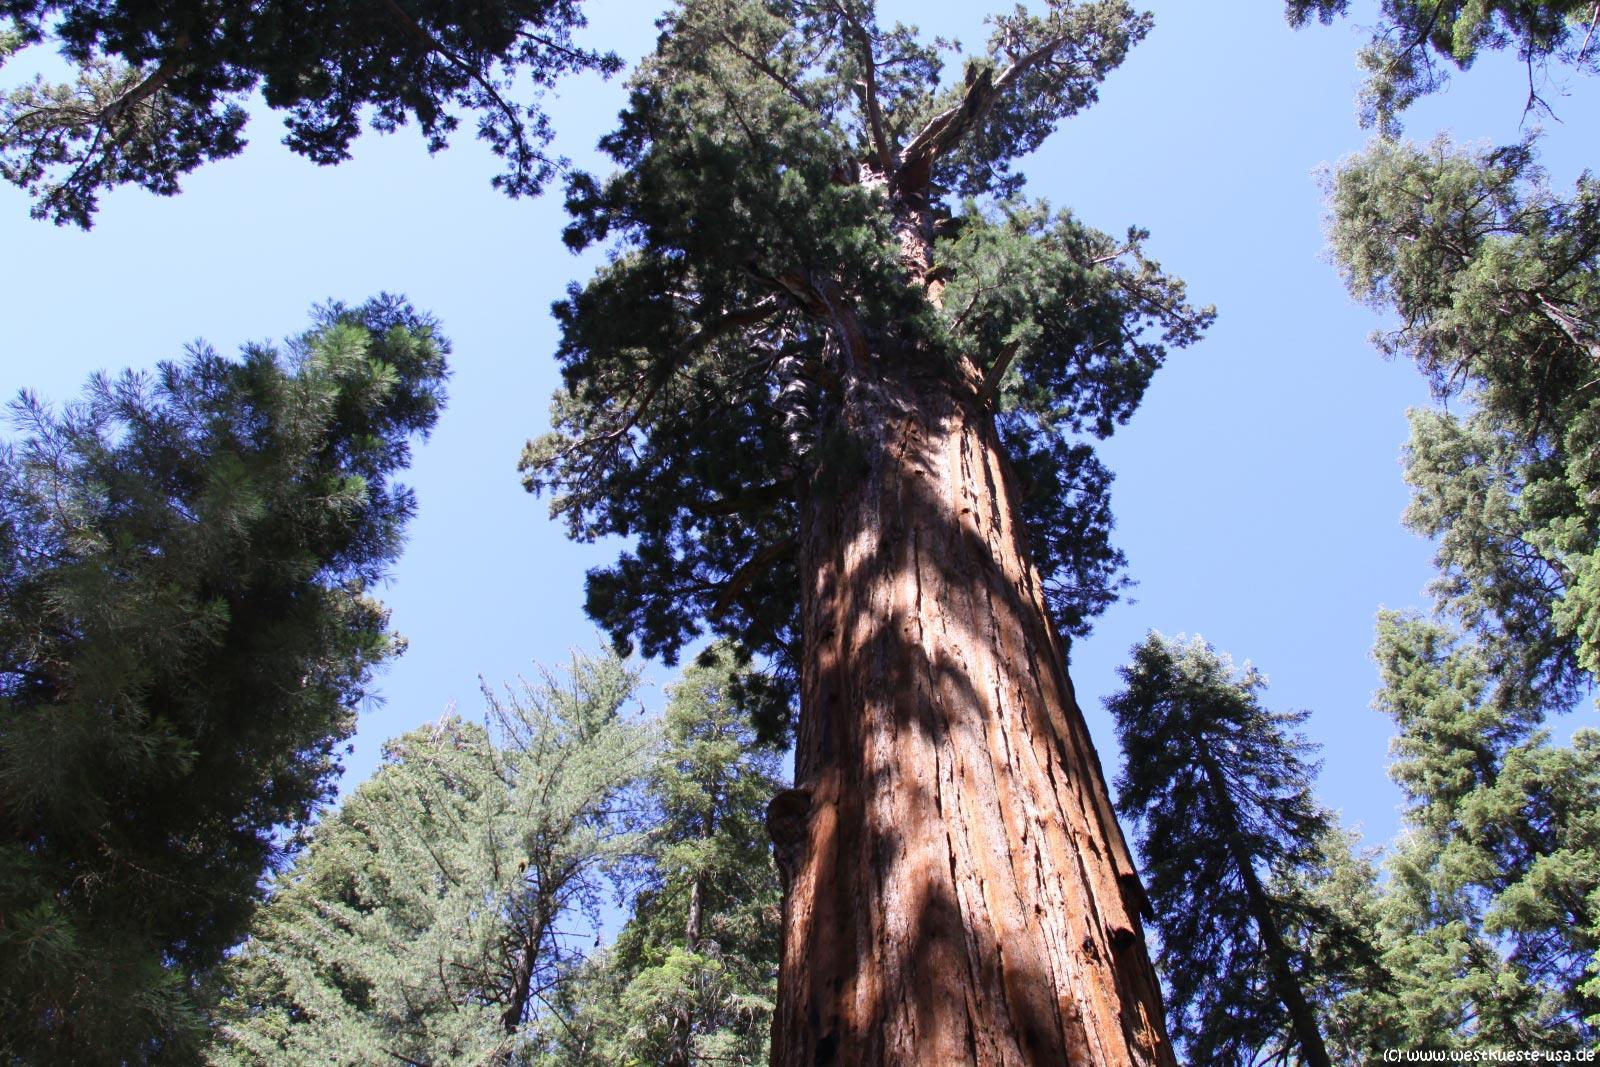 sequoia national park black single men 339 reviews of sequoia national park we have always stayed in visalia whenever we had visited sequoia national park to the sequoia park every single breath.